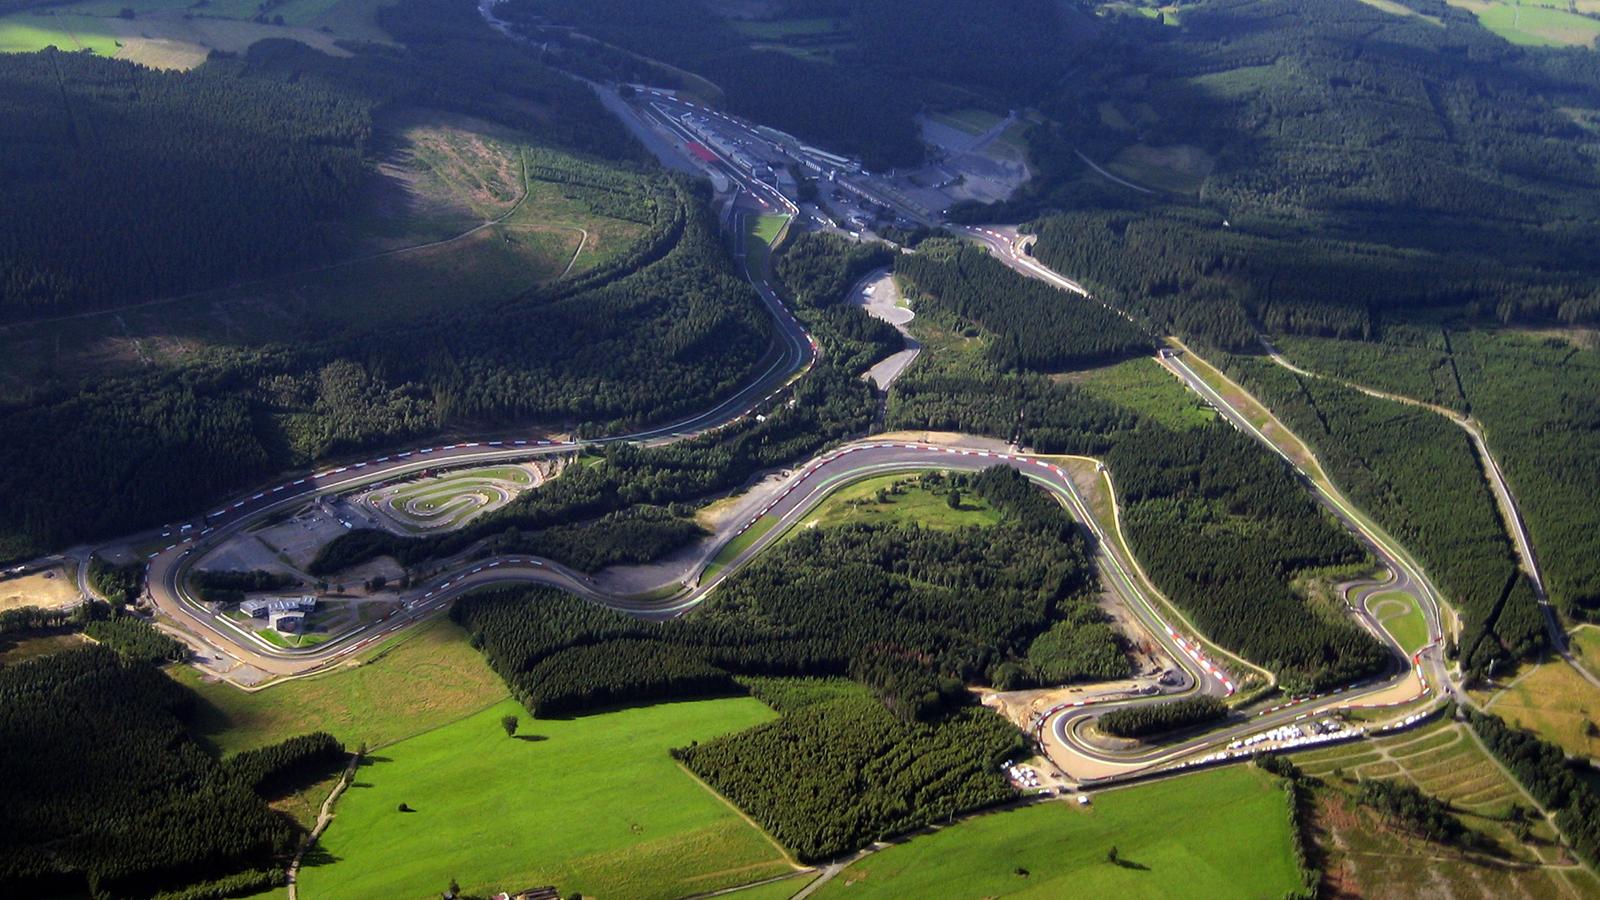 Spa Francorchamps, Belgium - Round One, 27 - 29 April 2018, Spa Belgium.Pure McLaren GT Series> Read Race Report